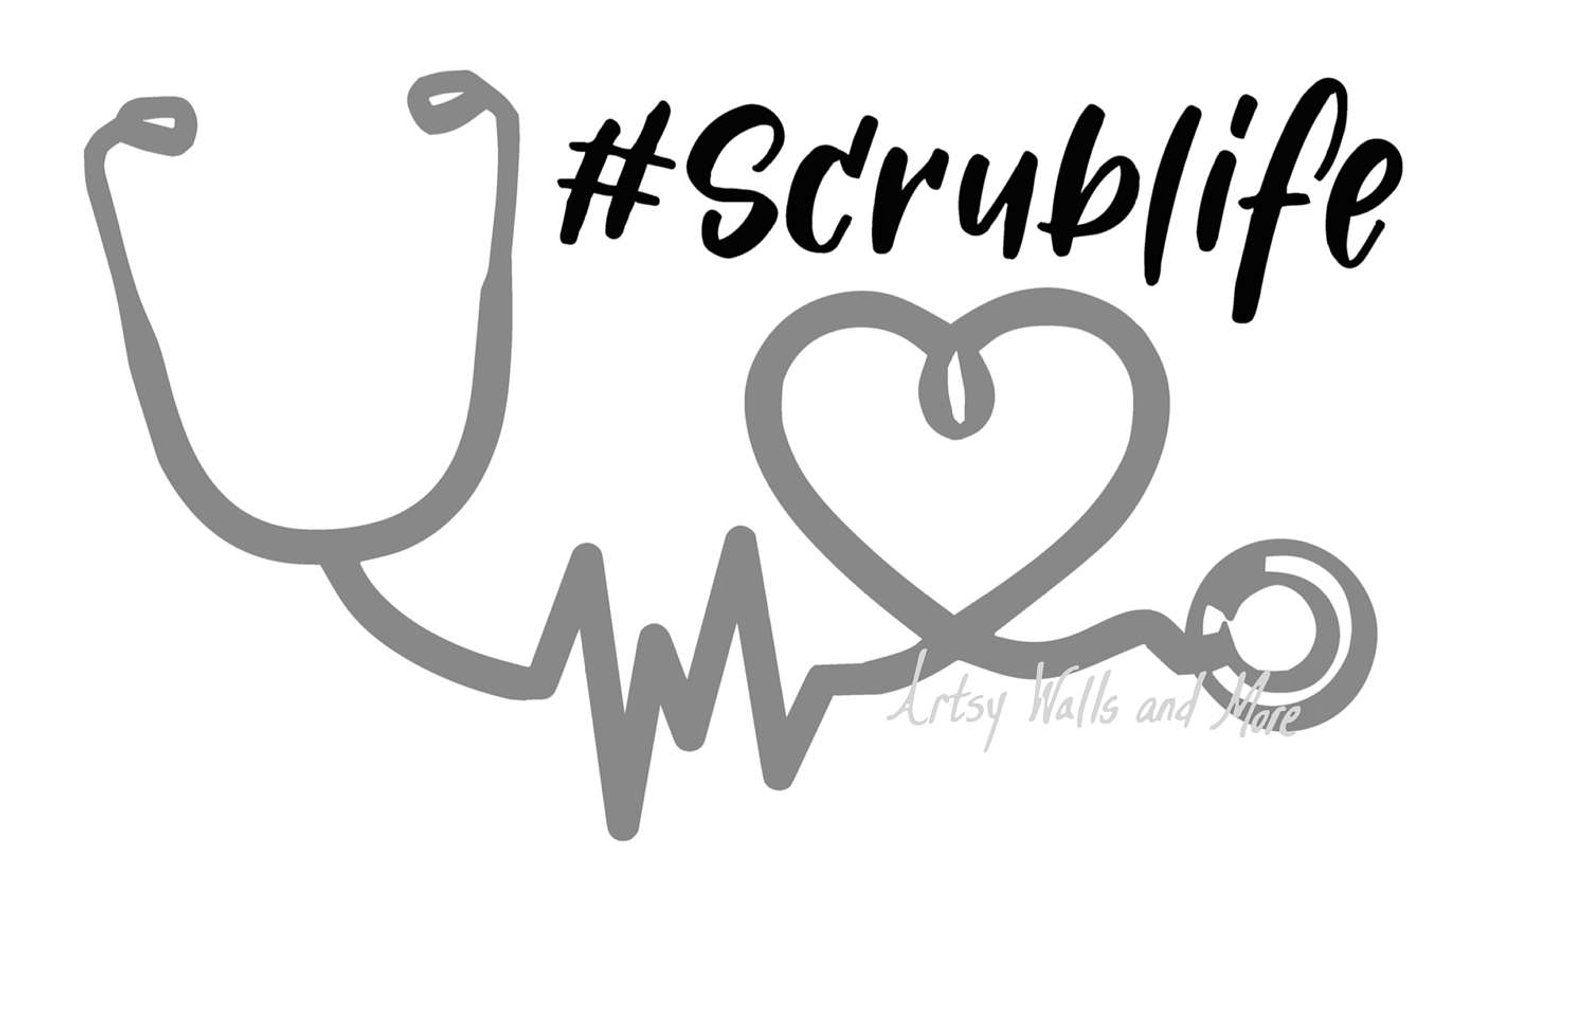 rn Cricut cna medical PNG SVG job Sihouette Cameo Nurse Life Stethoscope Cut File Vector doctor JPEG